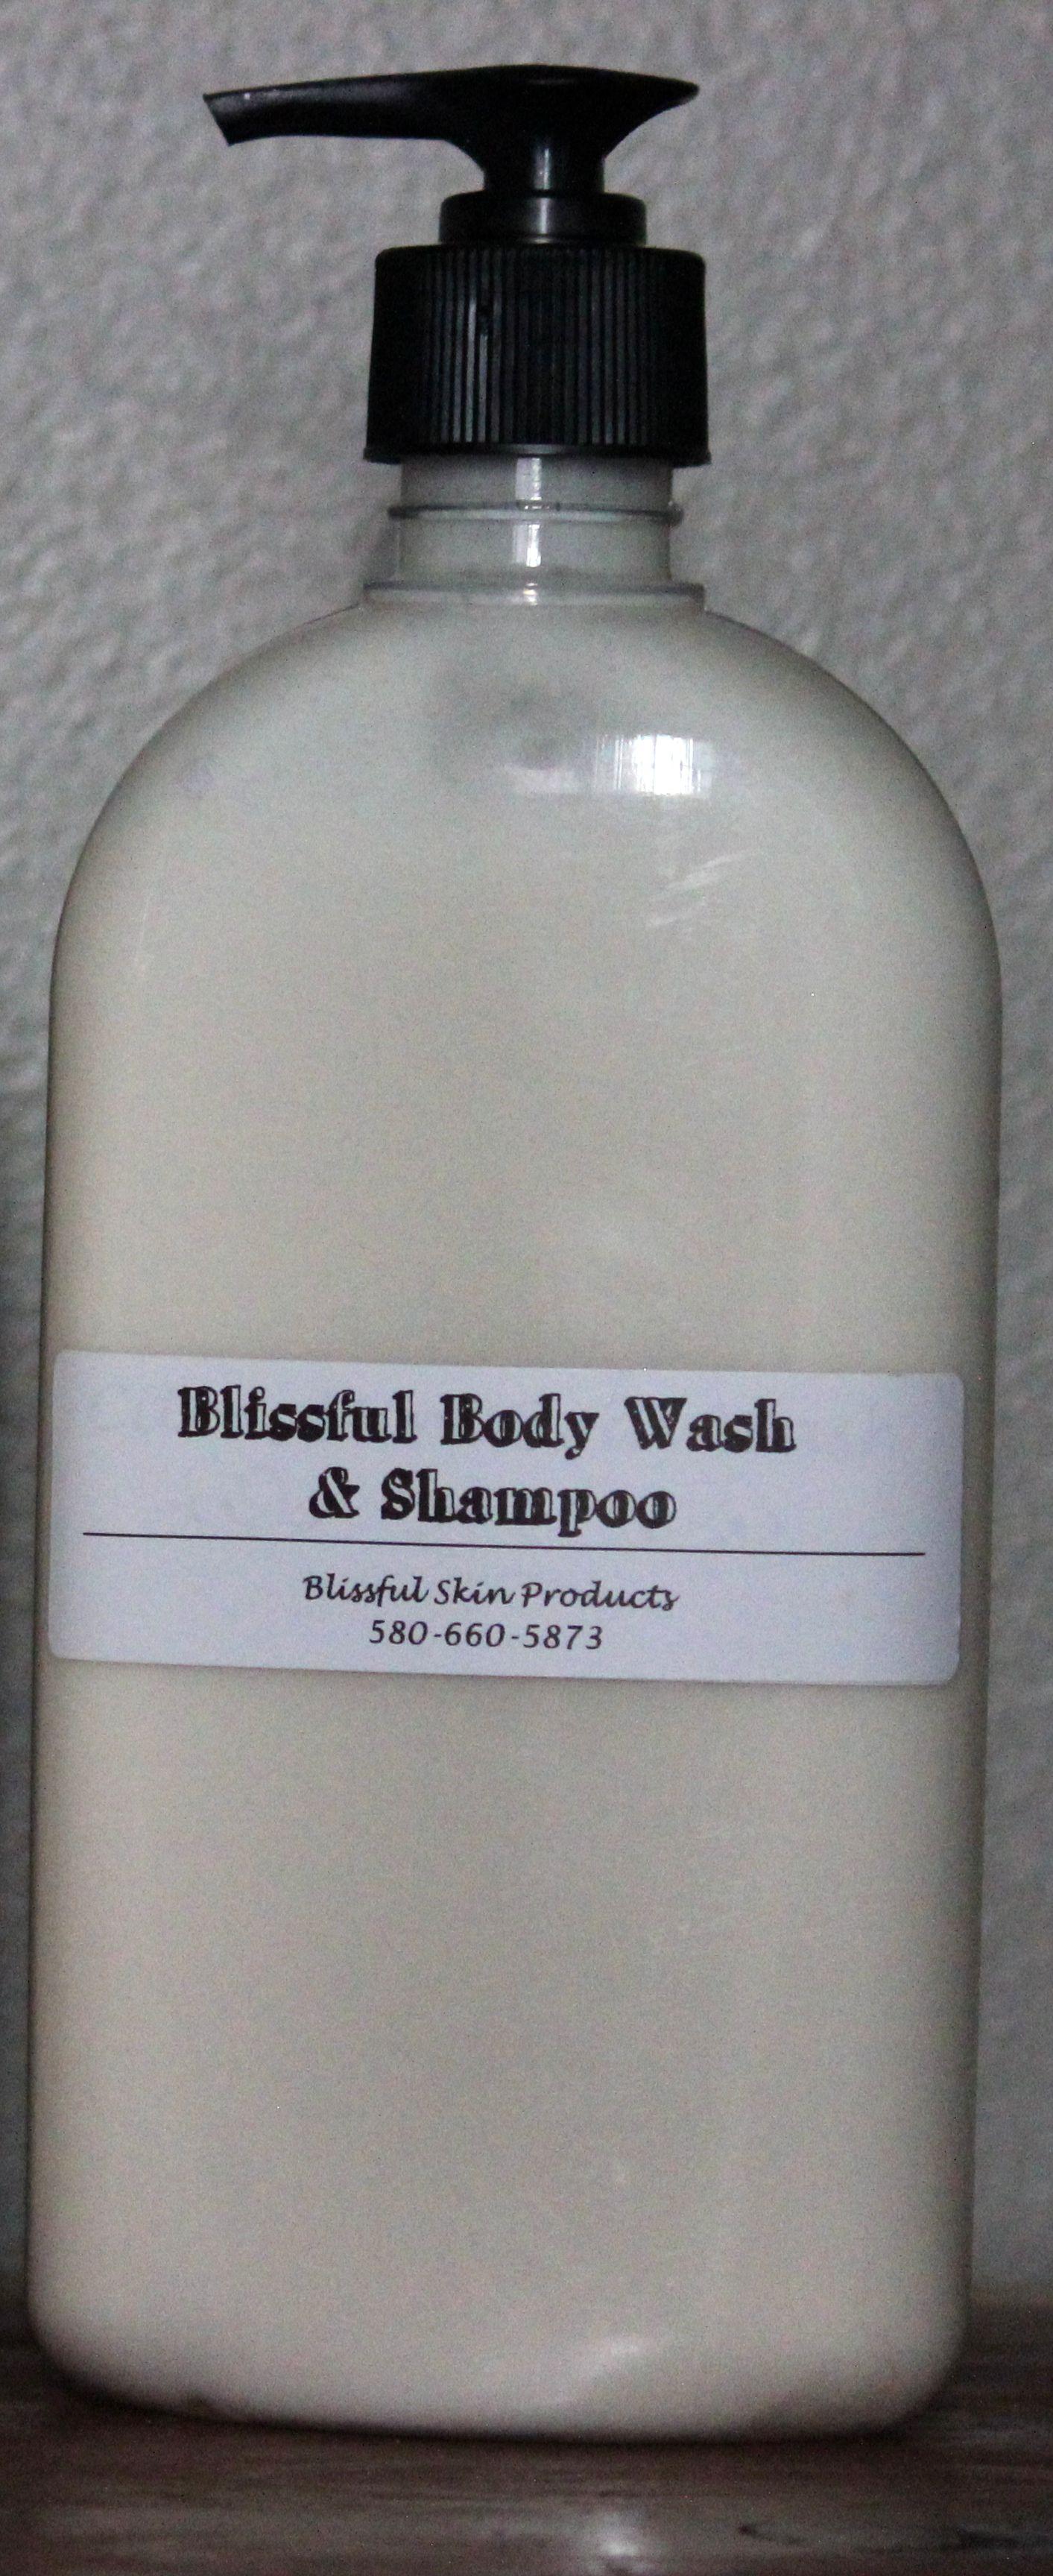 psoriasis natural eczema and dandruff body wash shampoo essential moisturizing oils